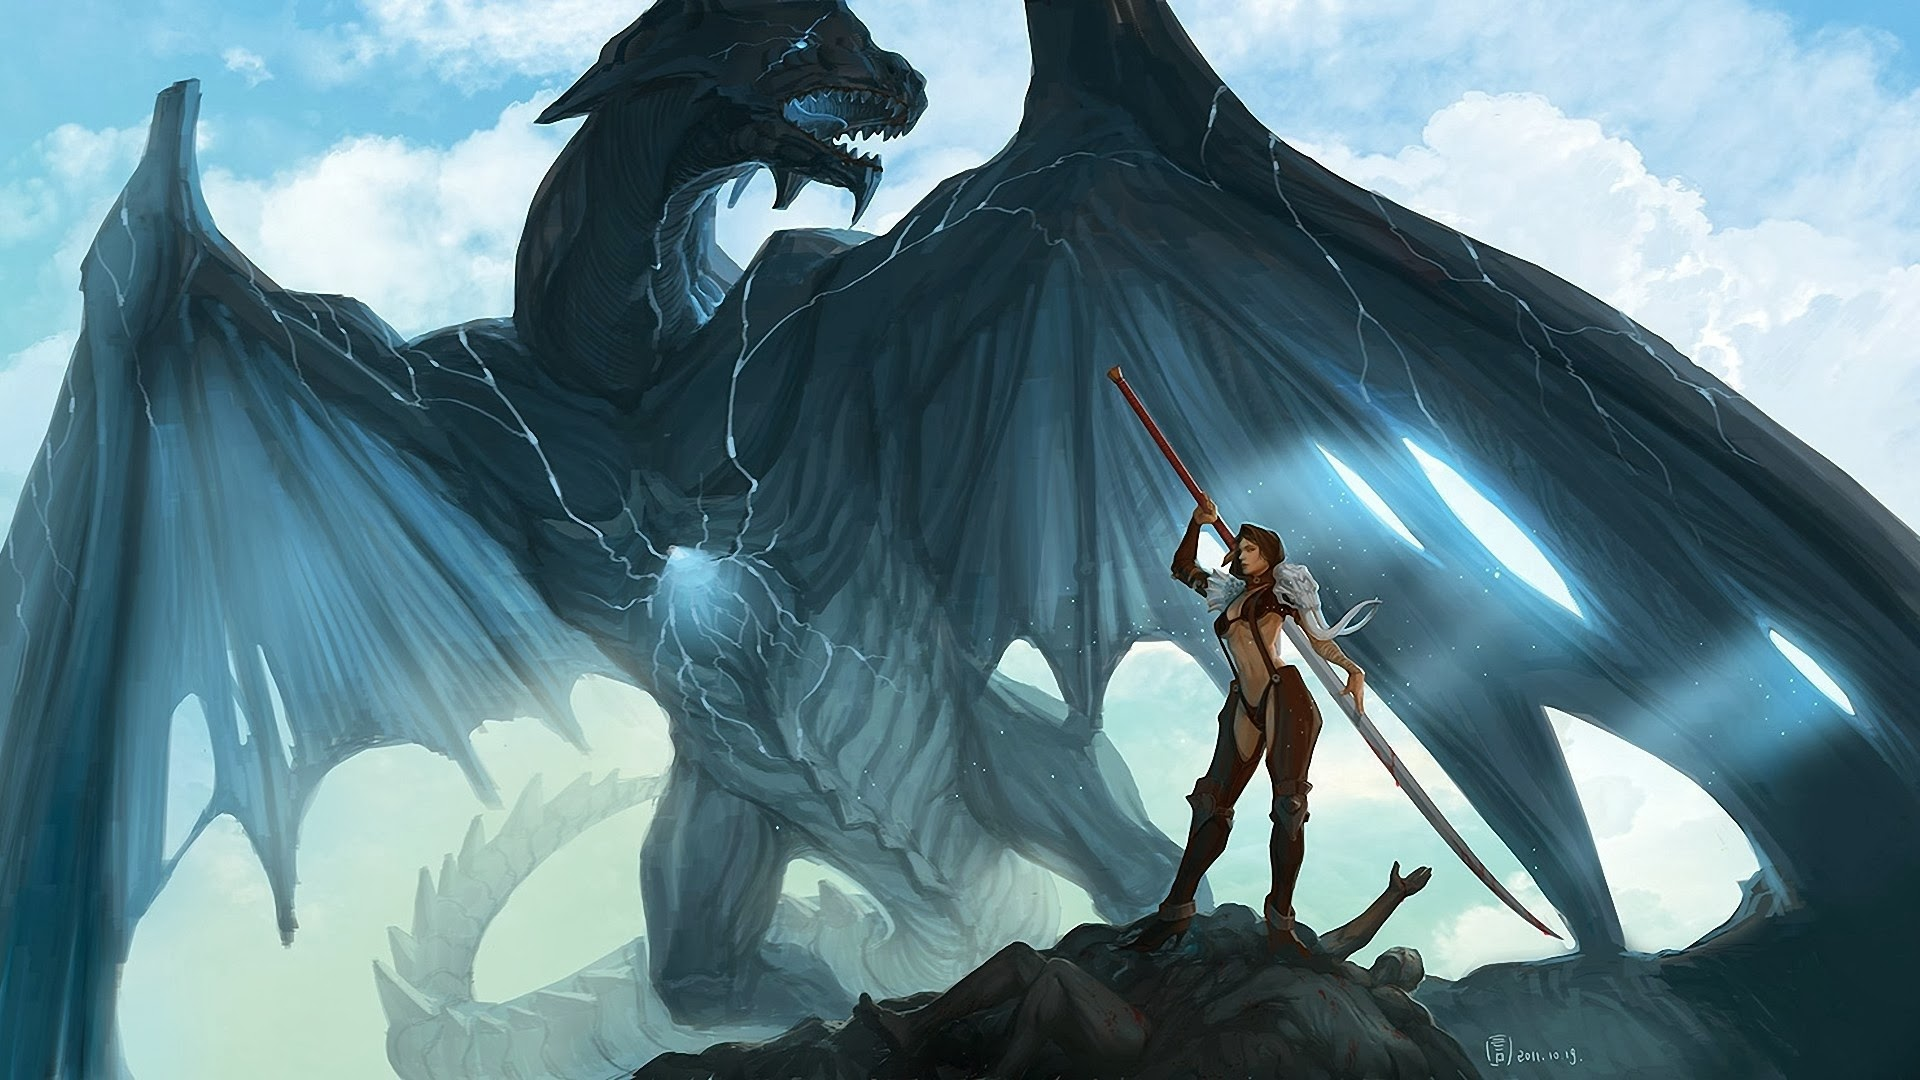 dragon fantasy warrior girl wallpaper hd 1920x1080 a691 1920x1080